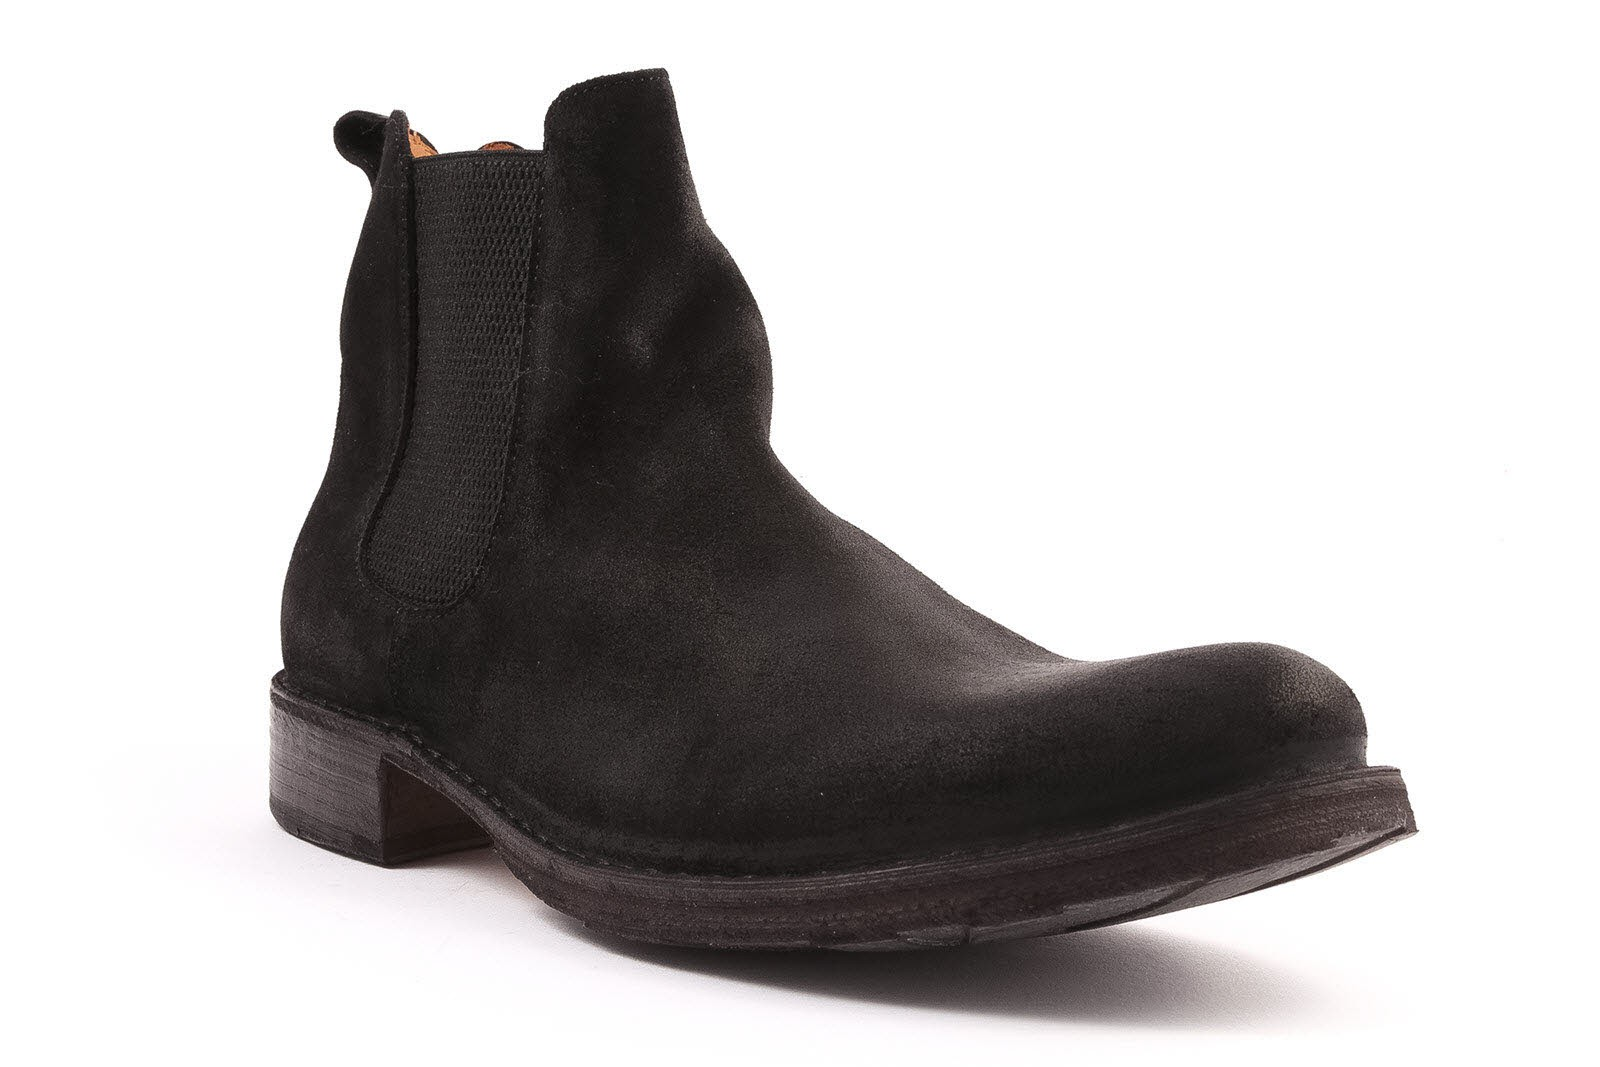 fiorentini baker etex nero boots men riccardo. Black Bedroom Furniture Sets. Home Design Ideas